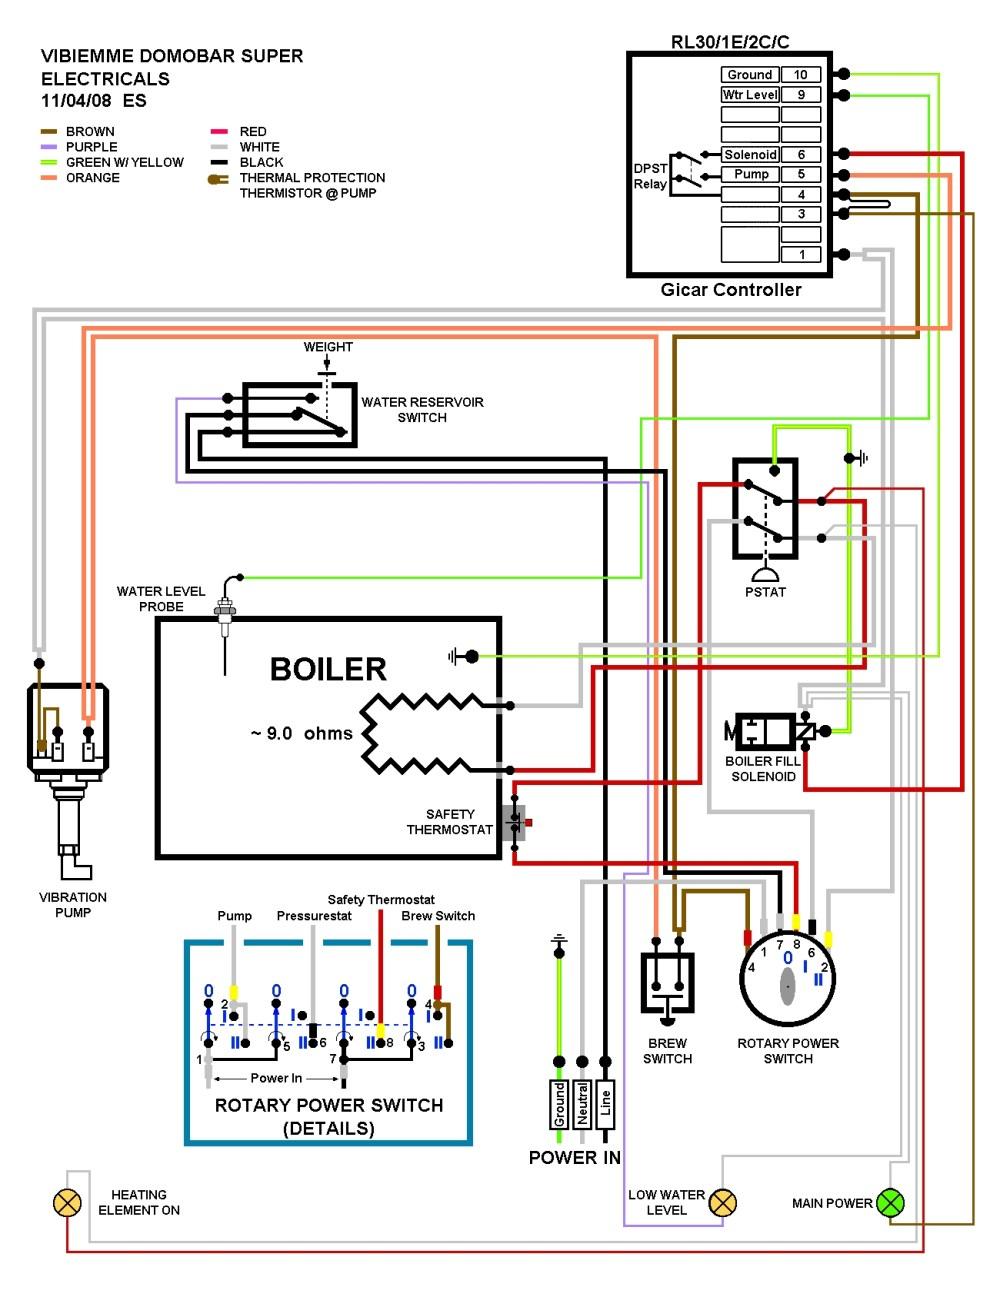 medium resolution of bunn switch wiring diagram bunn coffee wire diagrams 12v switch wiring diagram single pole switch wiring diagram